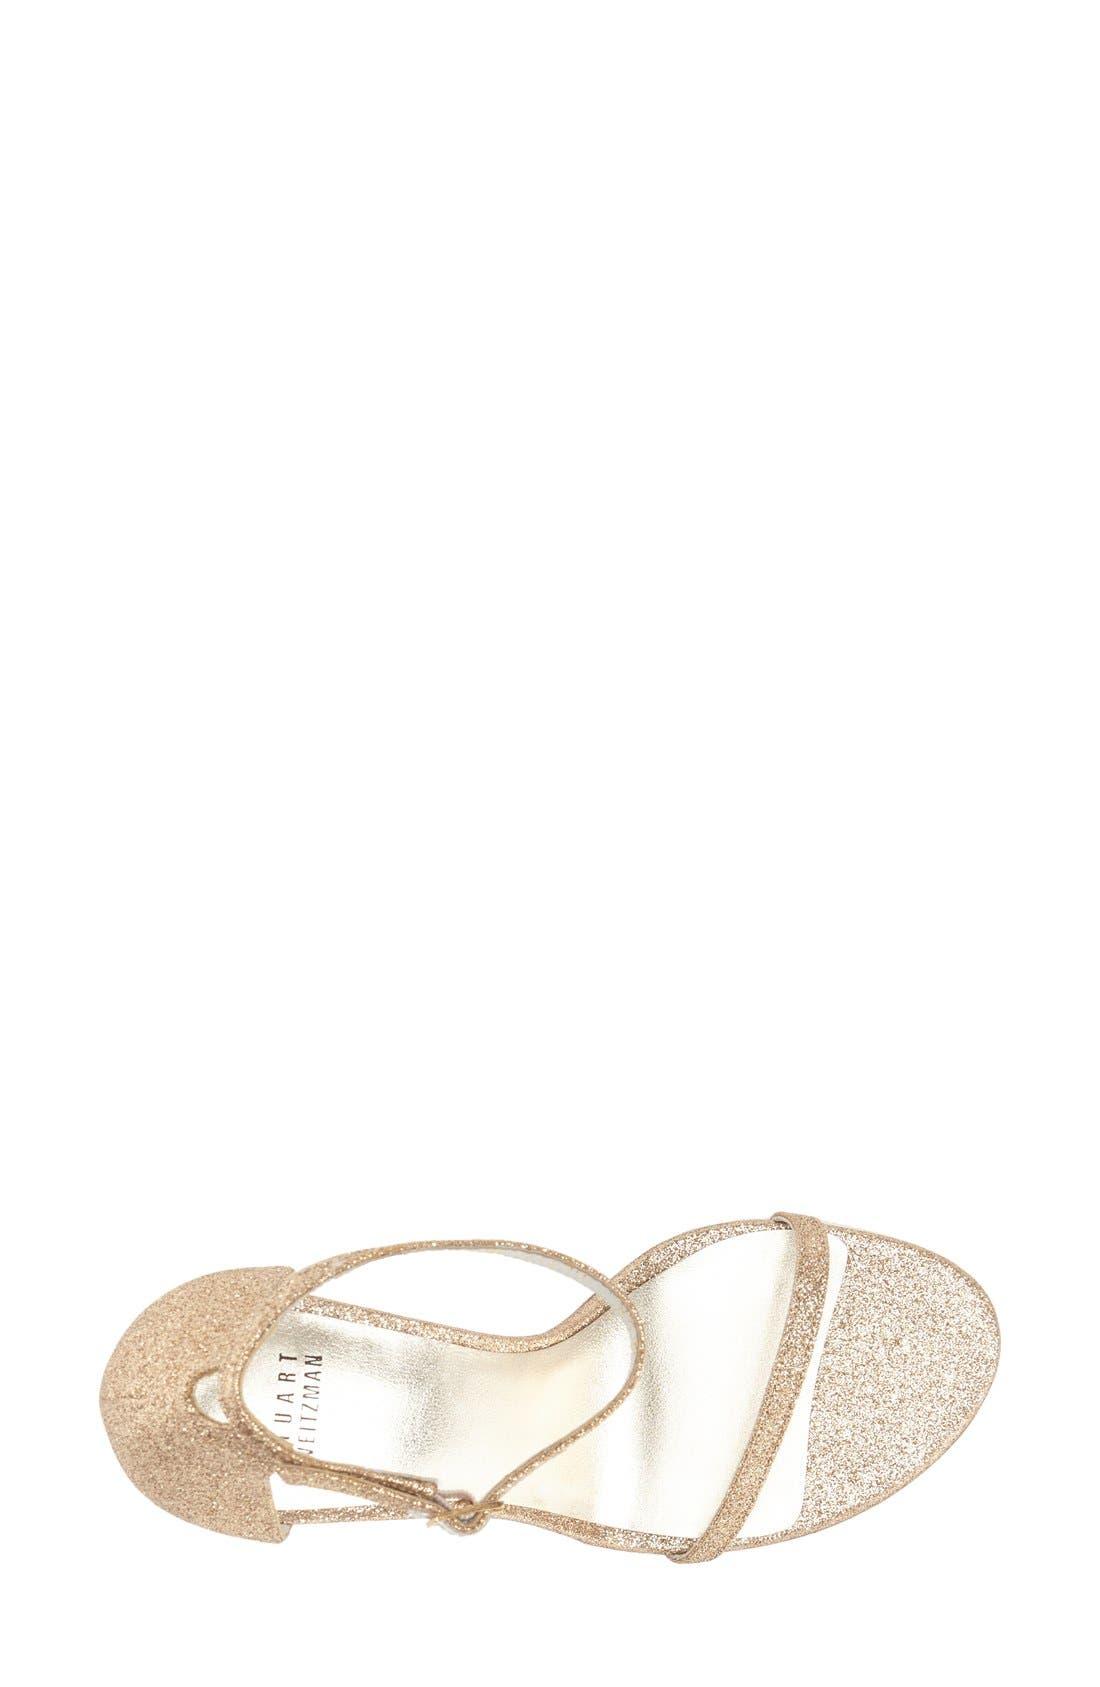 Nudistsong Ankle Strap Sandal,                             Alternate thumbnail 128, color,